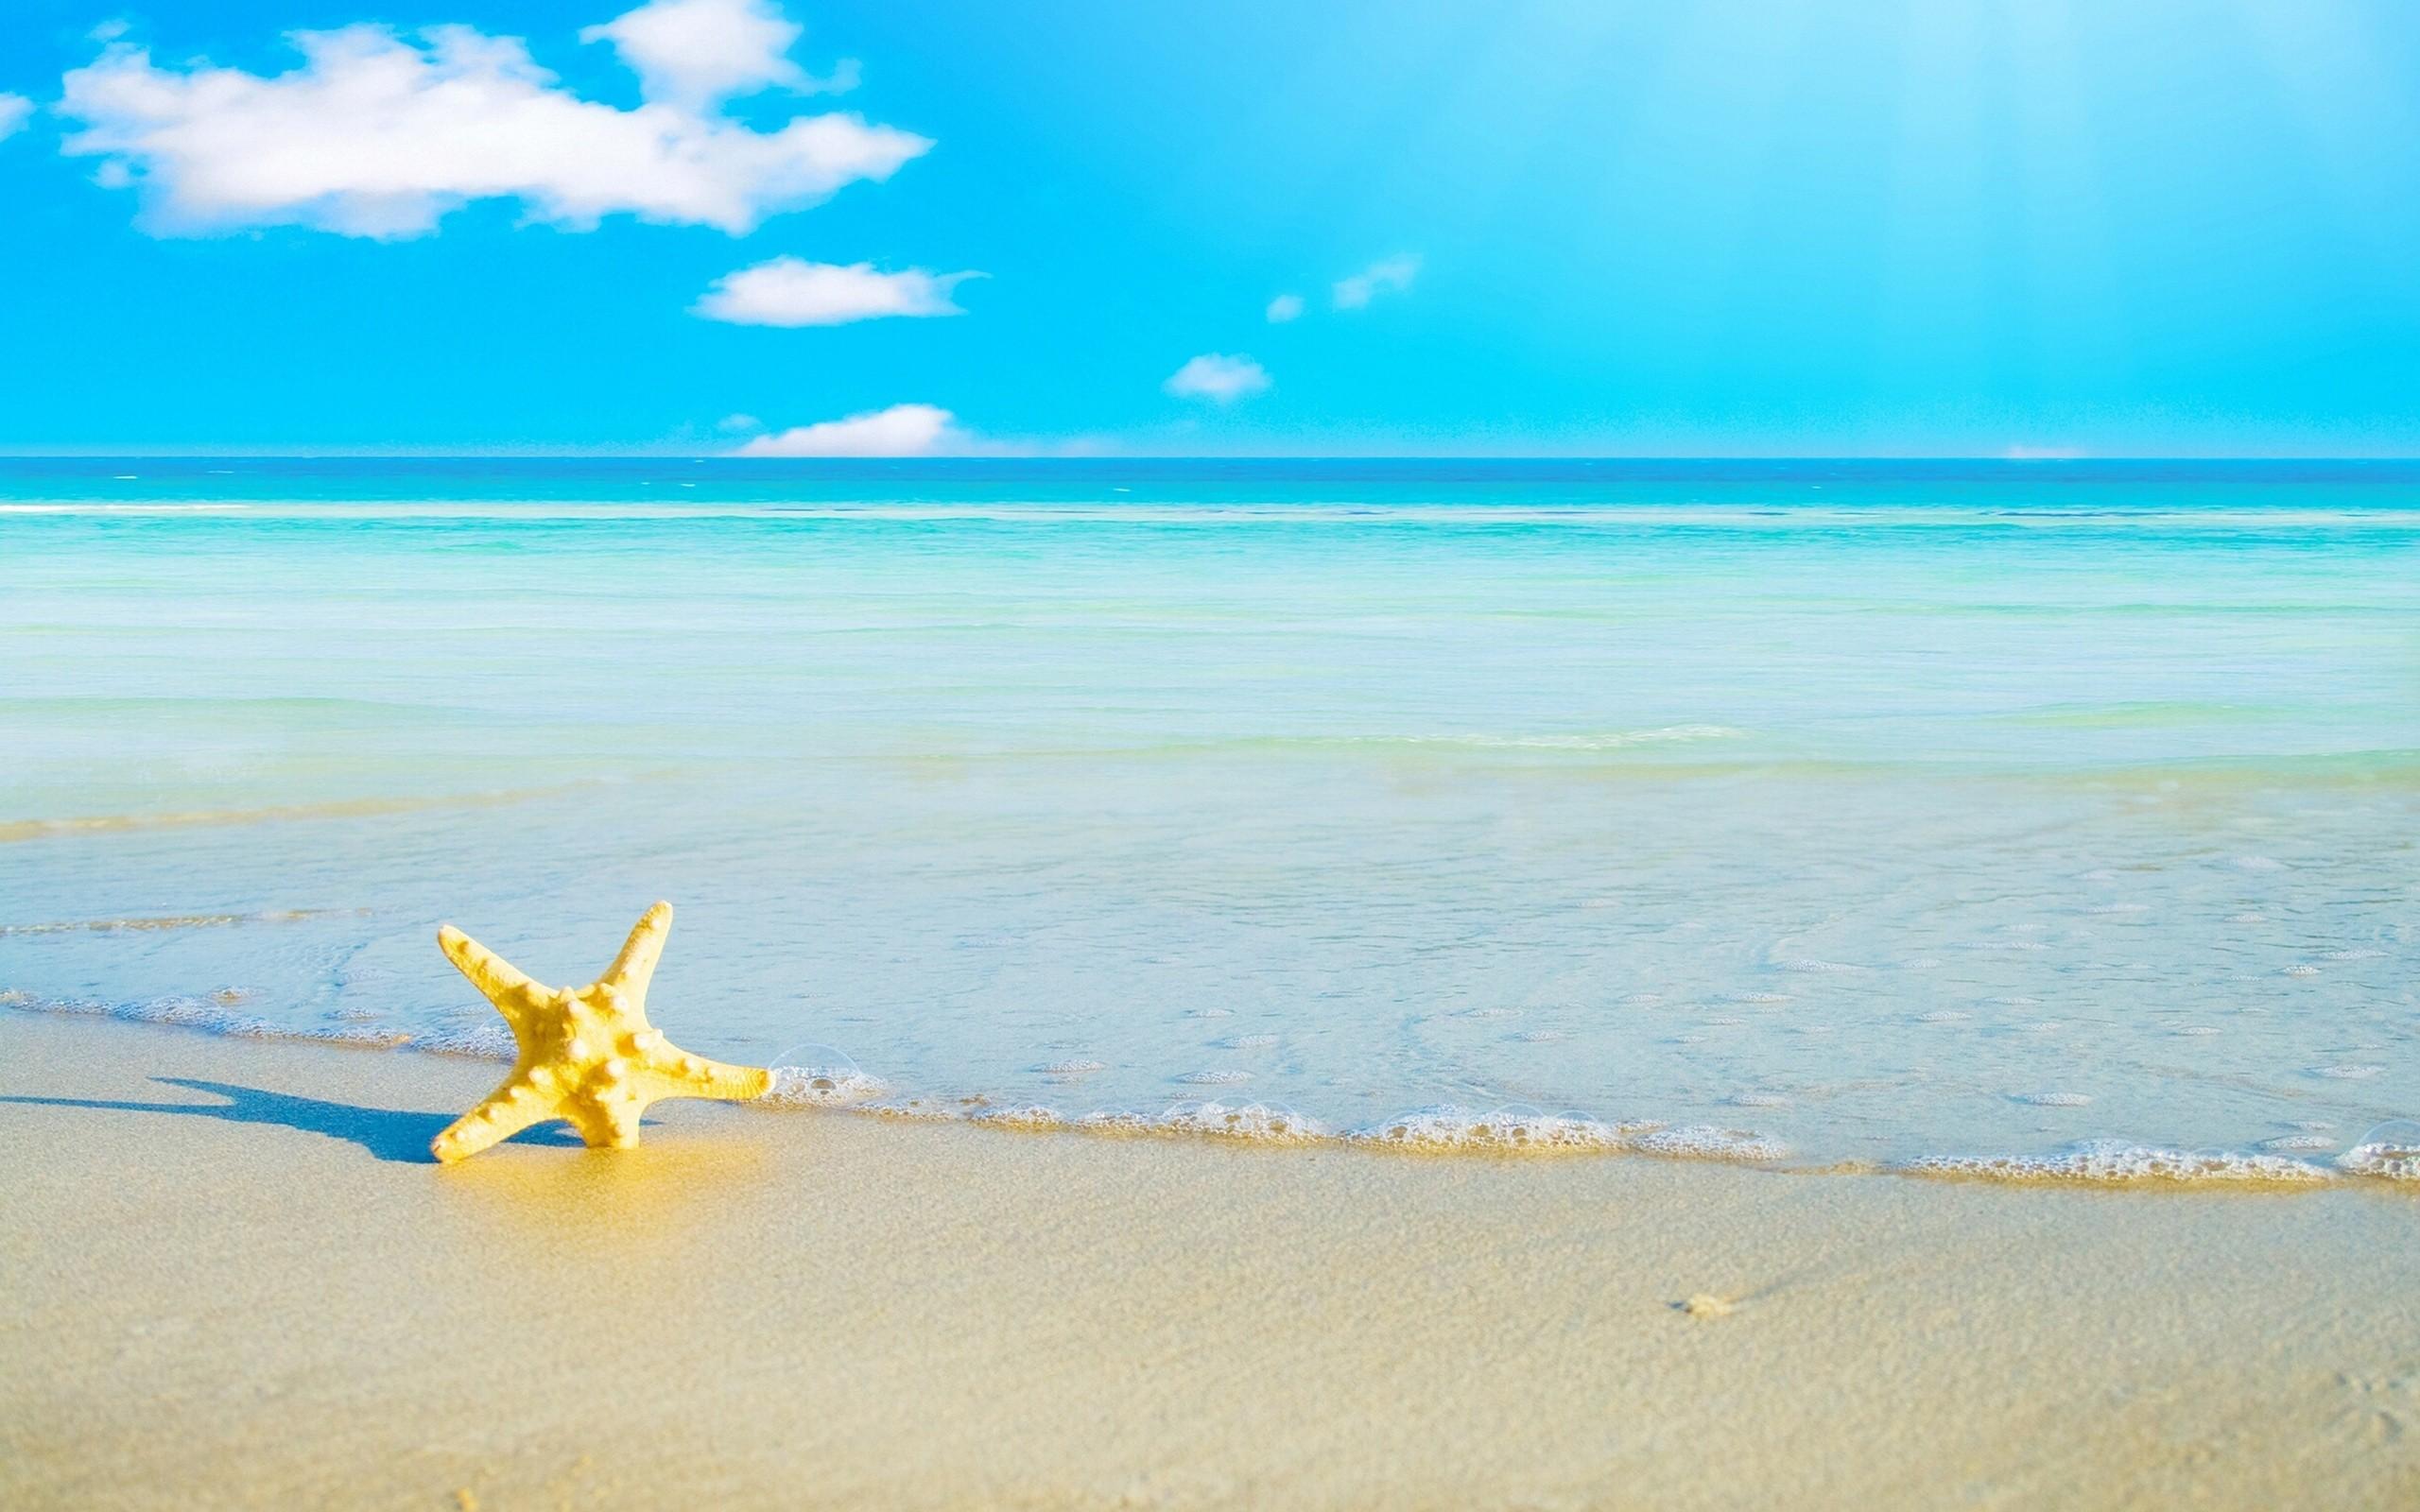 Una estrella en la playa - 2560x1600